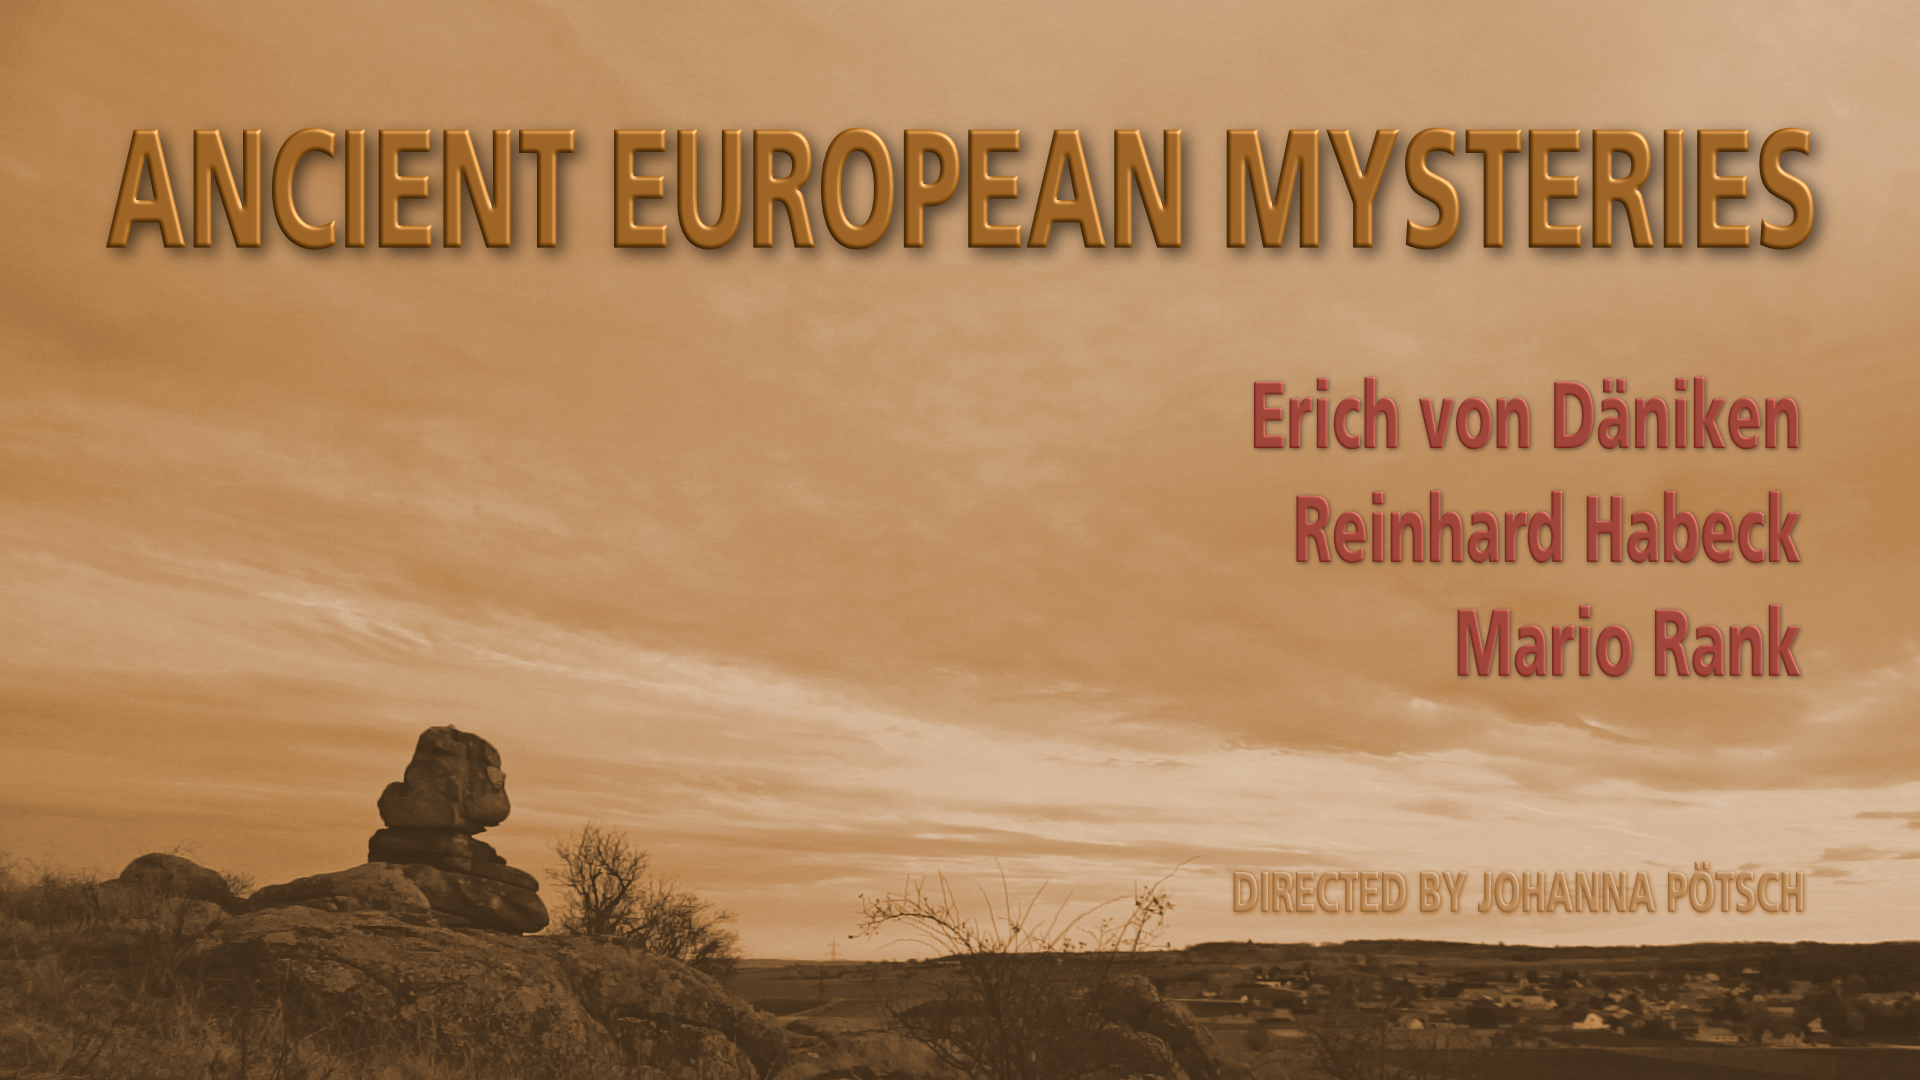 Ancient European Mysteries